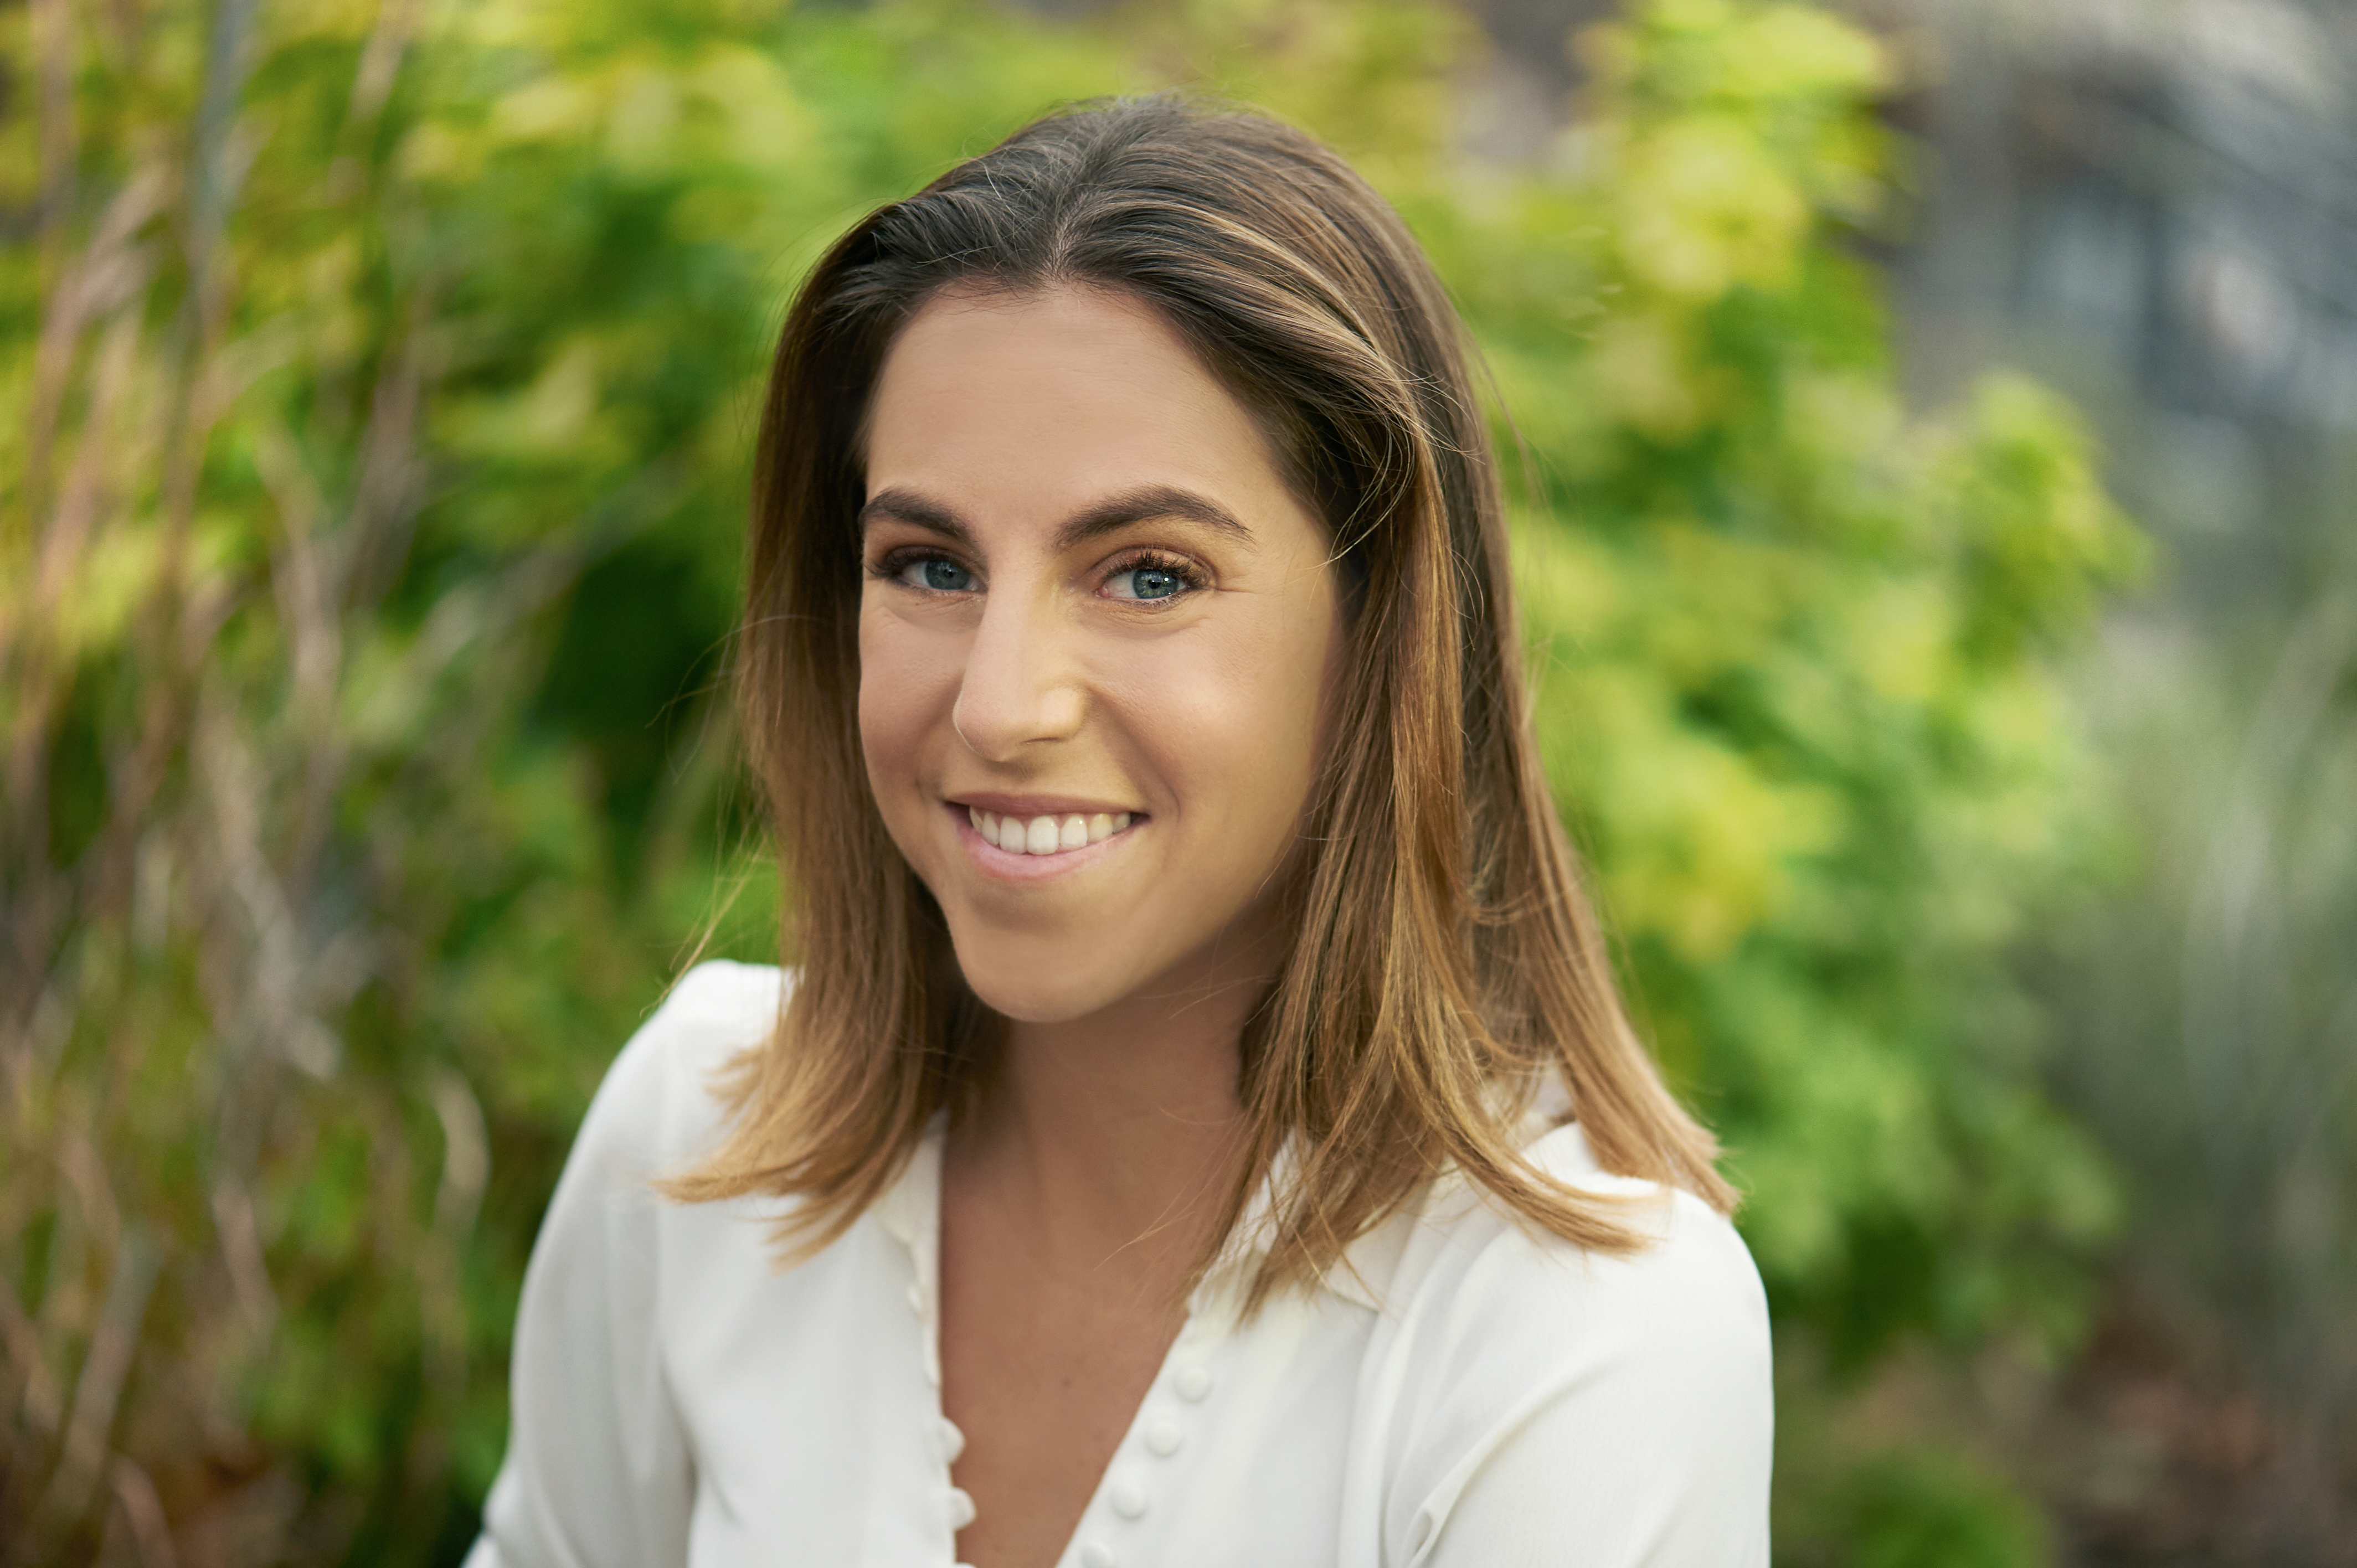 Fernanda Cantarell